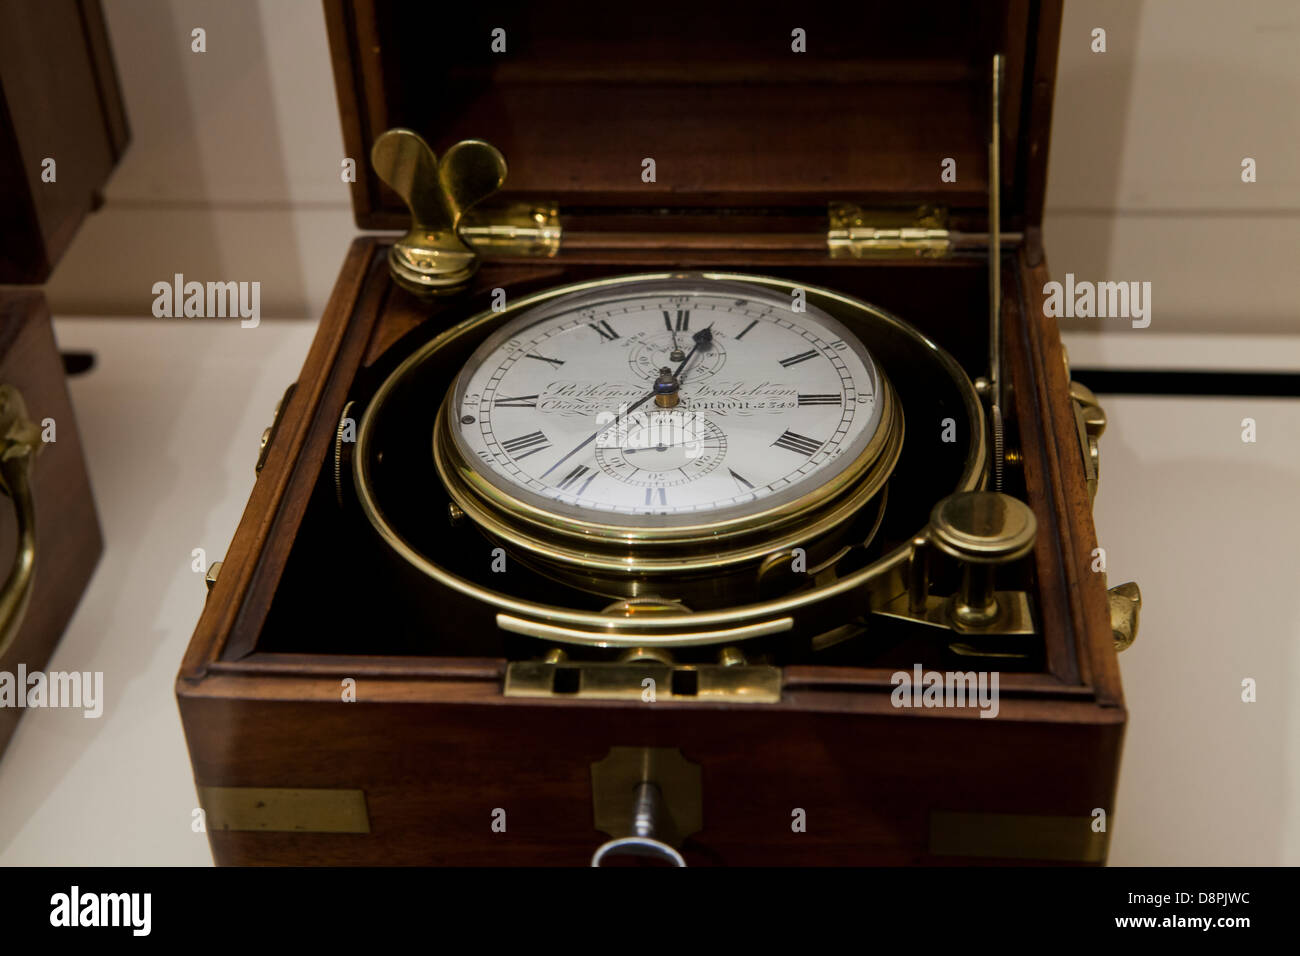 Antique marine Chronometer by Parkinson & Frodsham, ca 1840 - Stock Image